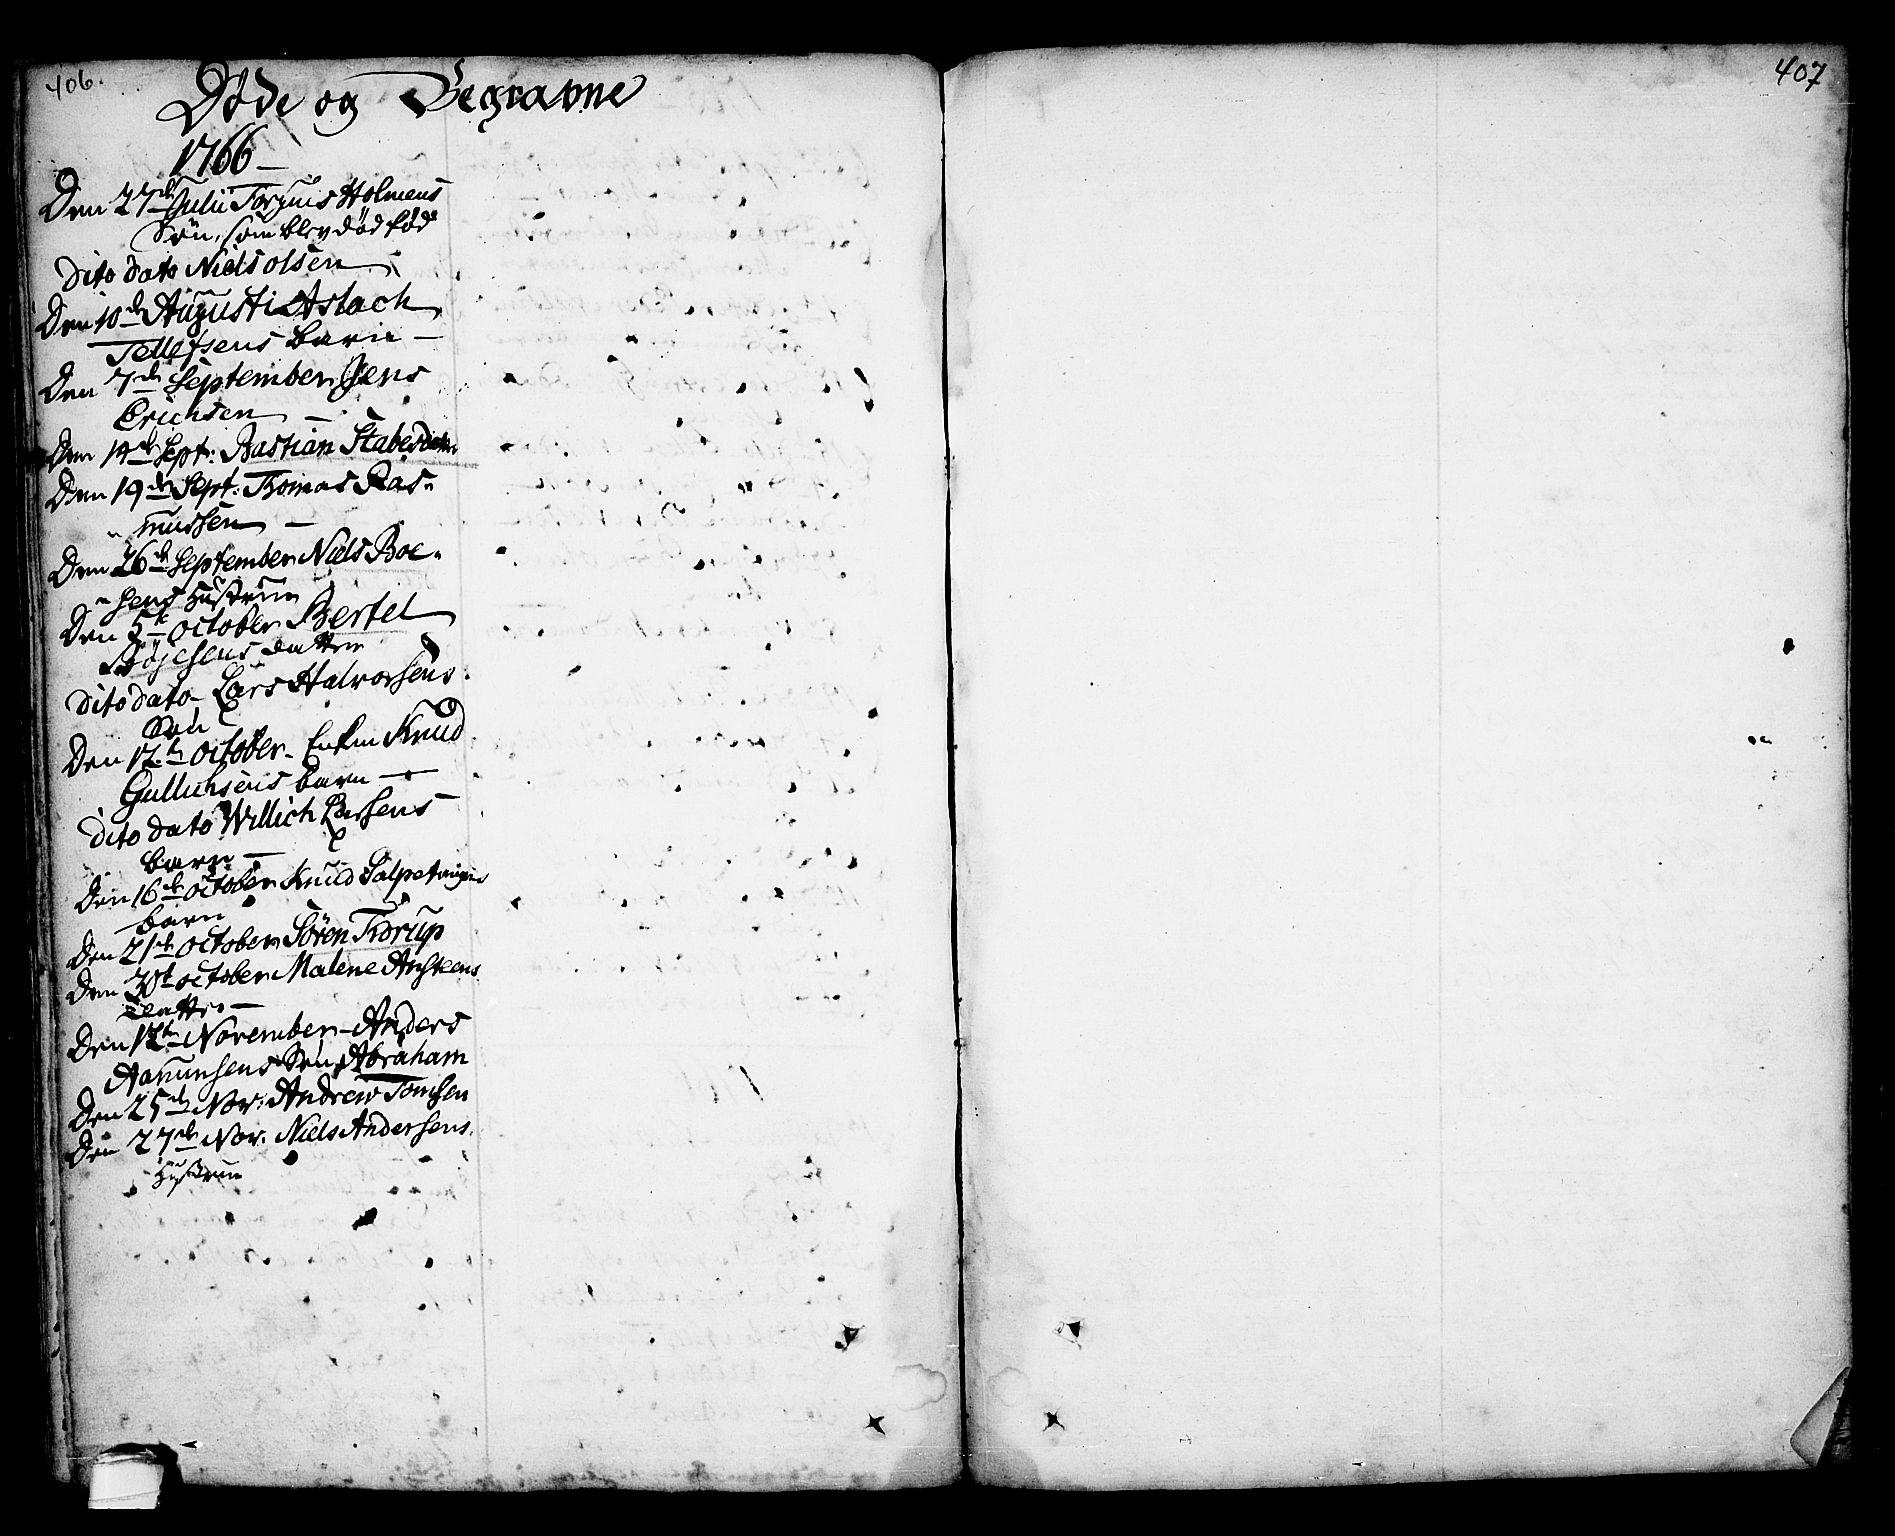 SAKO, Kragerø kirkebøker, F/Fa/L0001: Ministerialbok nr. 1, 1702-1766, s. 406-407